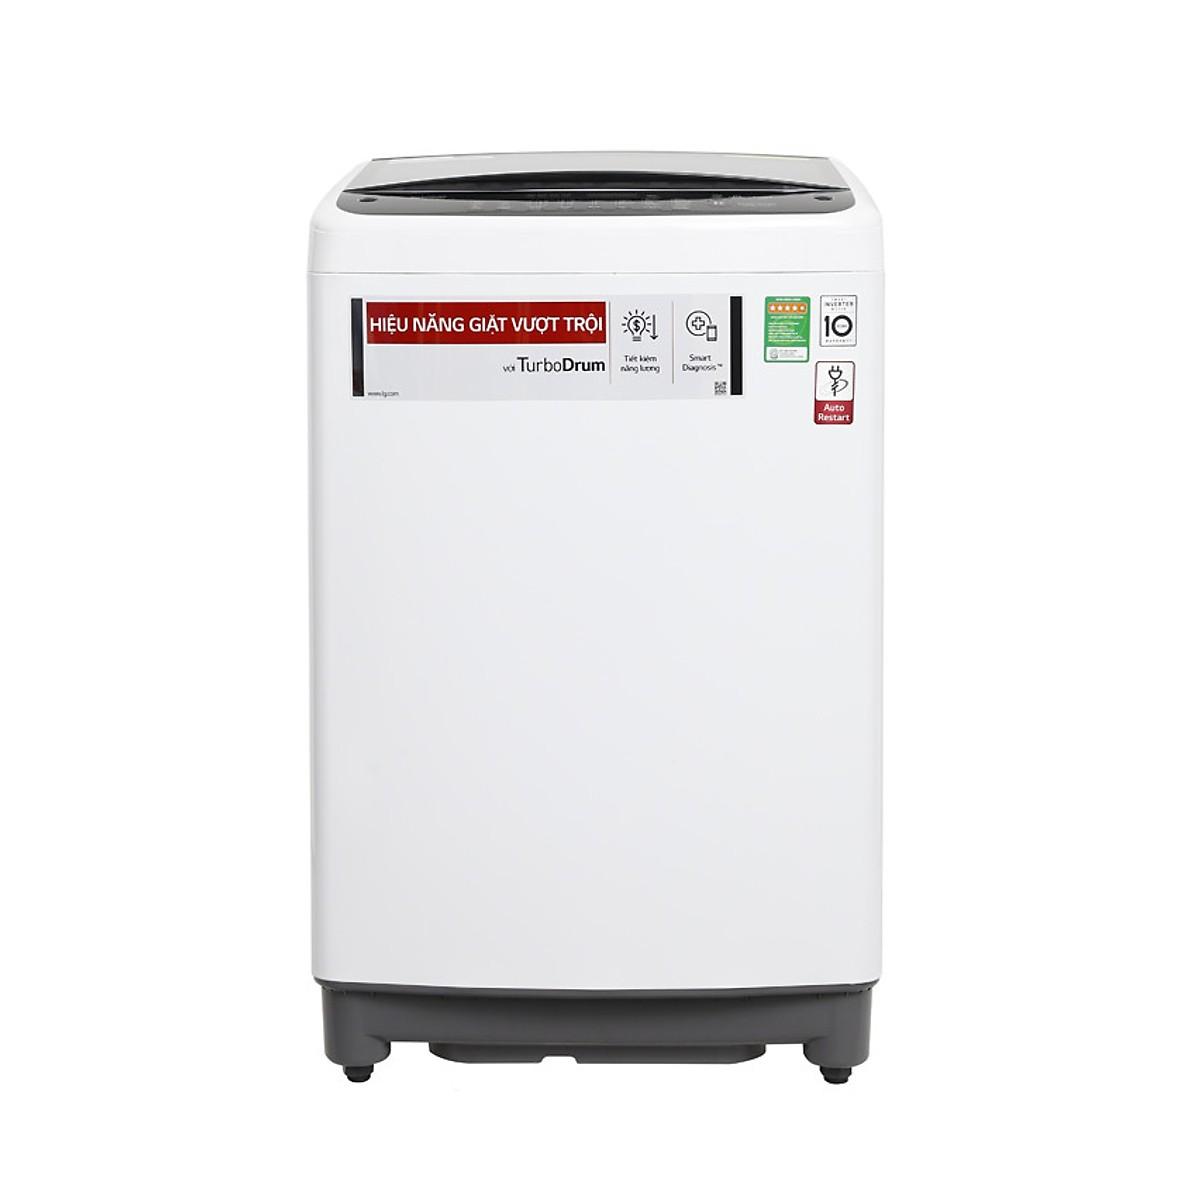 Máy giặt LG Inverter 9 kg5 T2395VS2W | Chaoban.com.vn